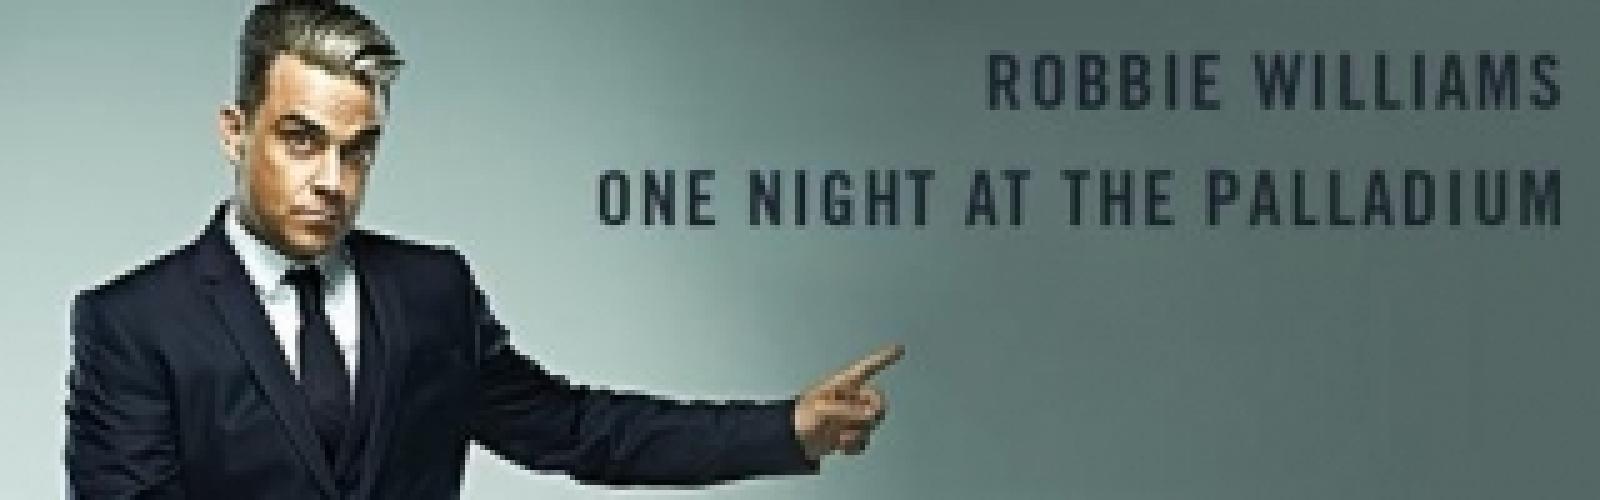 Robbie Williams One Night at the Palladium next episode air date poster